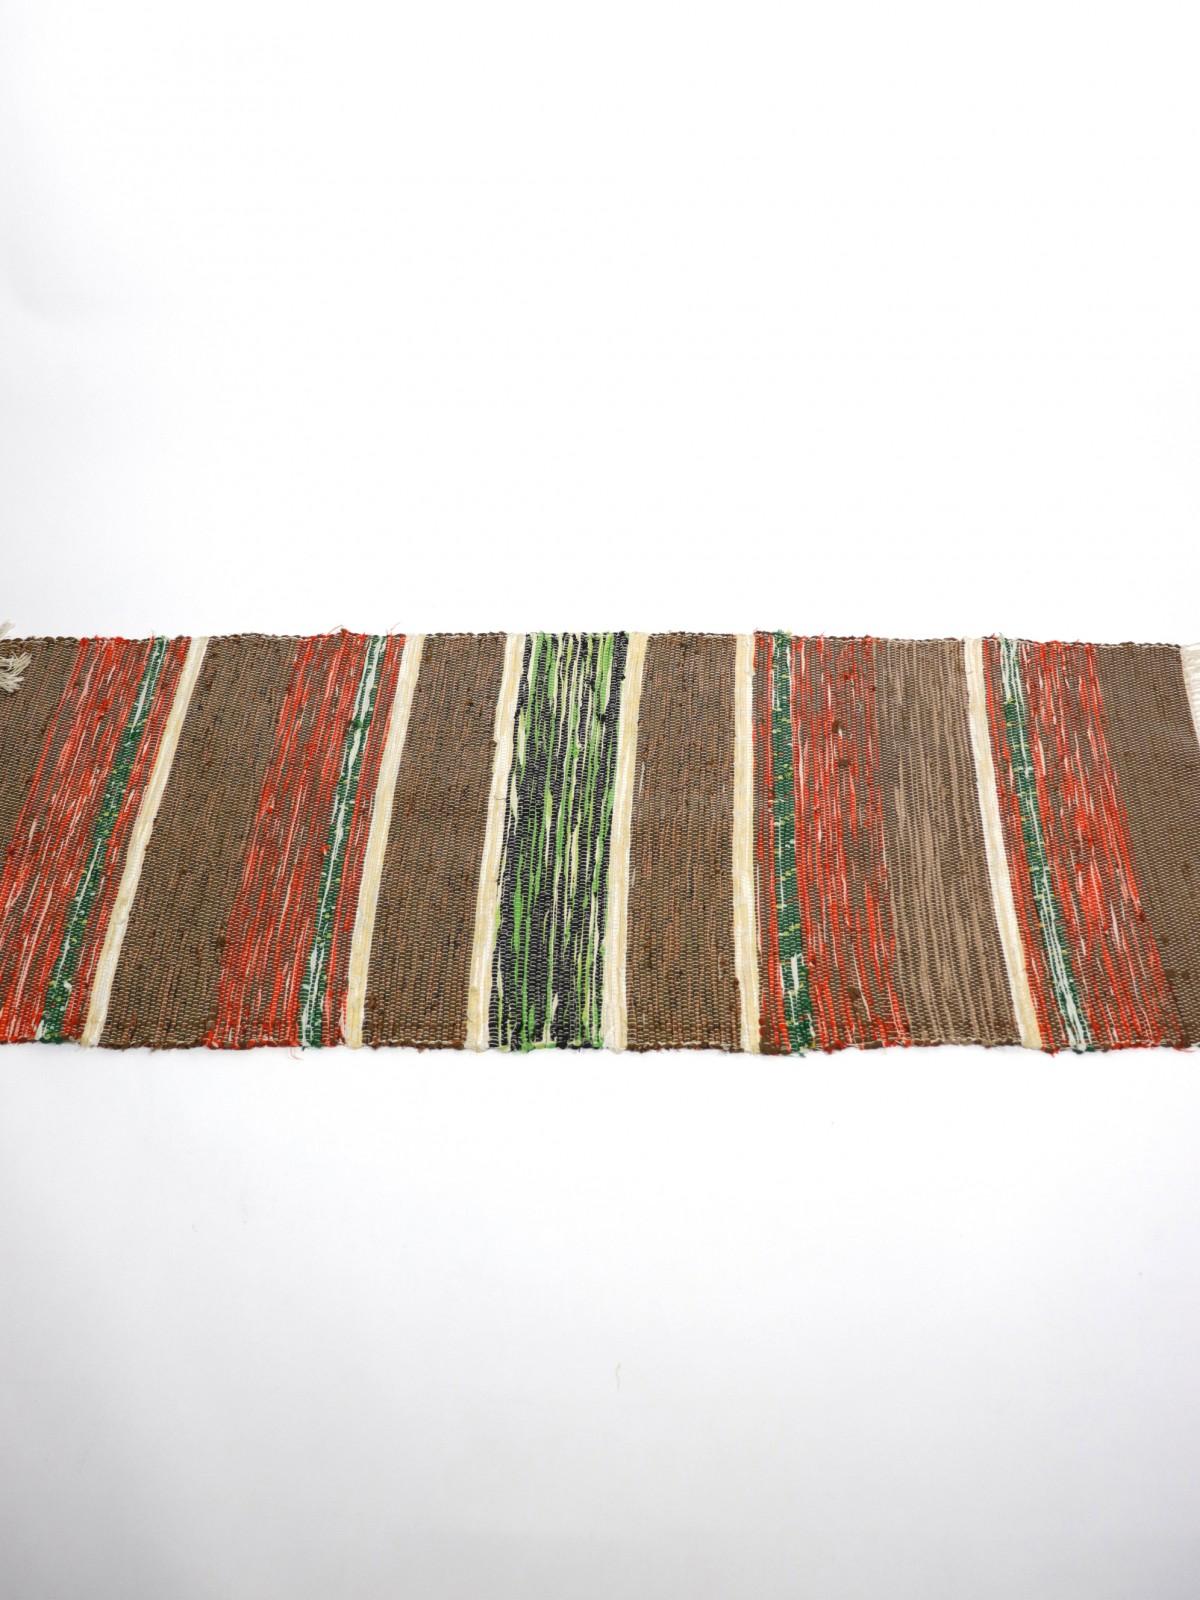 Swedish rag rug, cotton, 1930-1950's